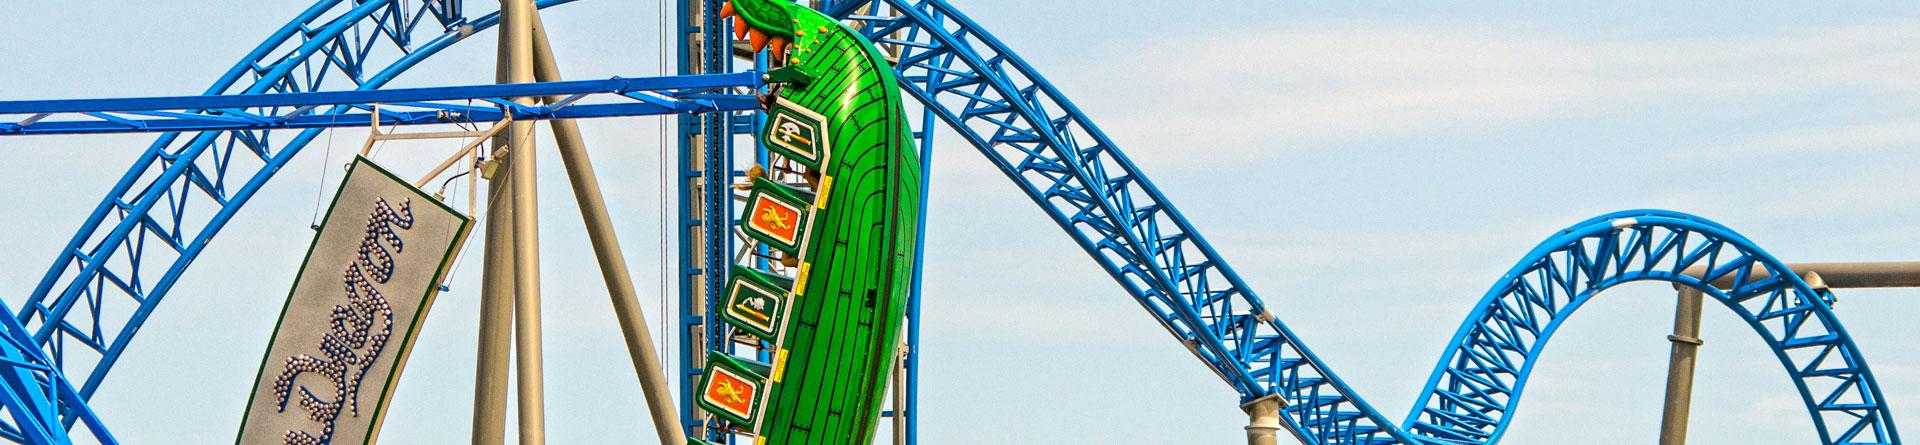 Thrills and Amusements - Pleasure Pier Roller Coaster